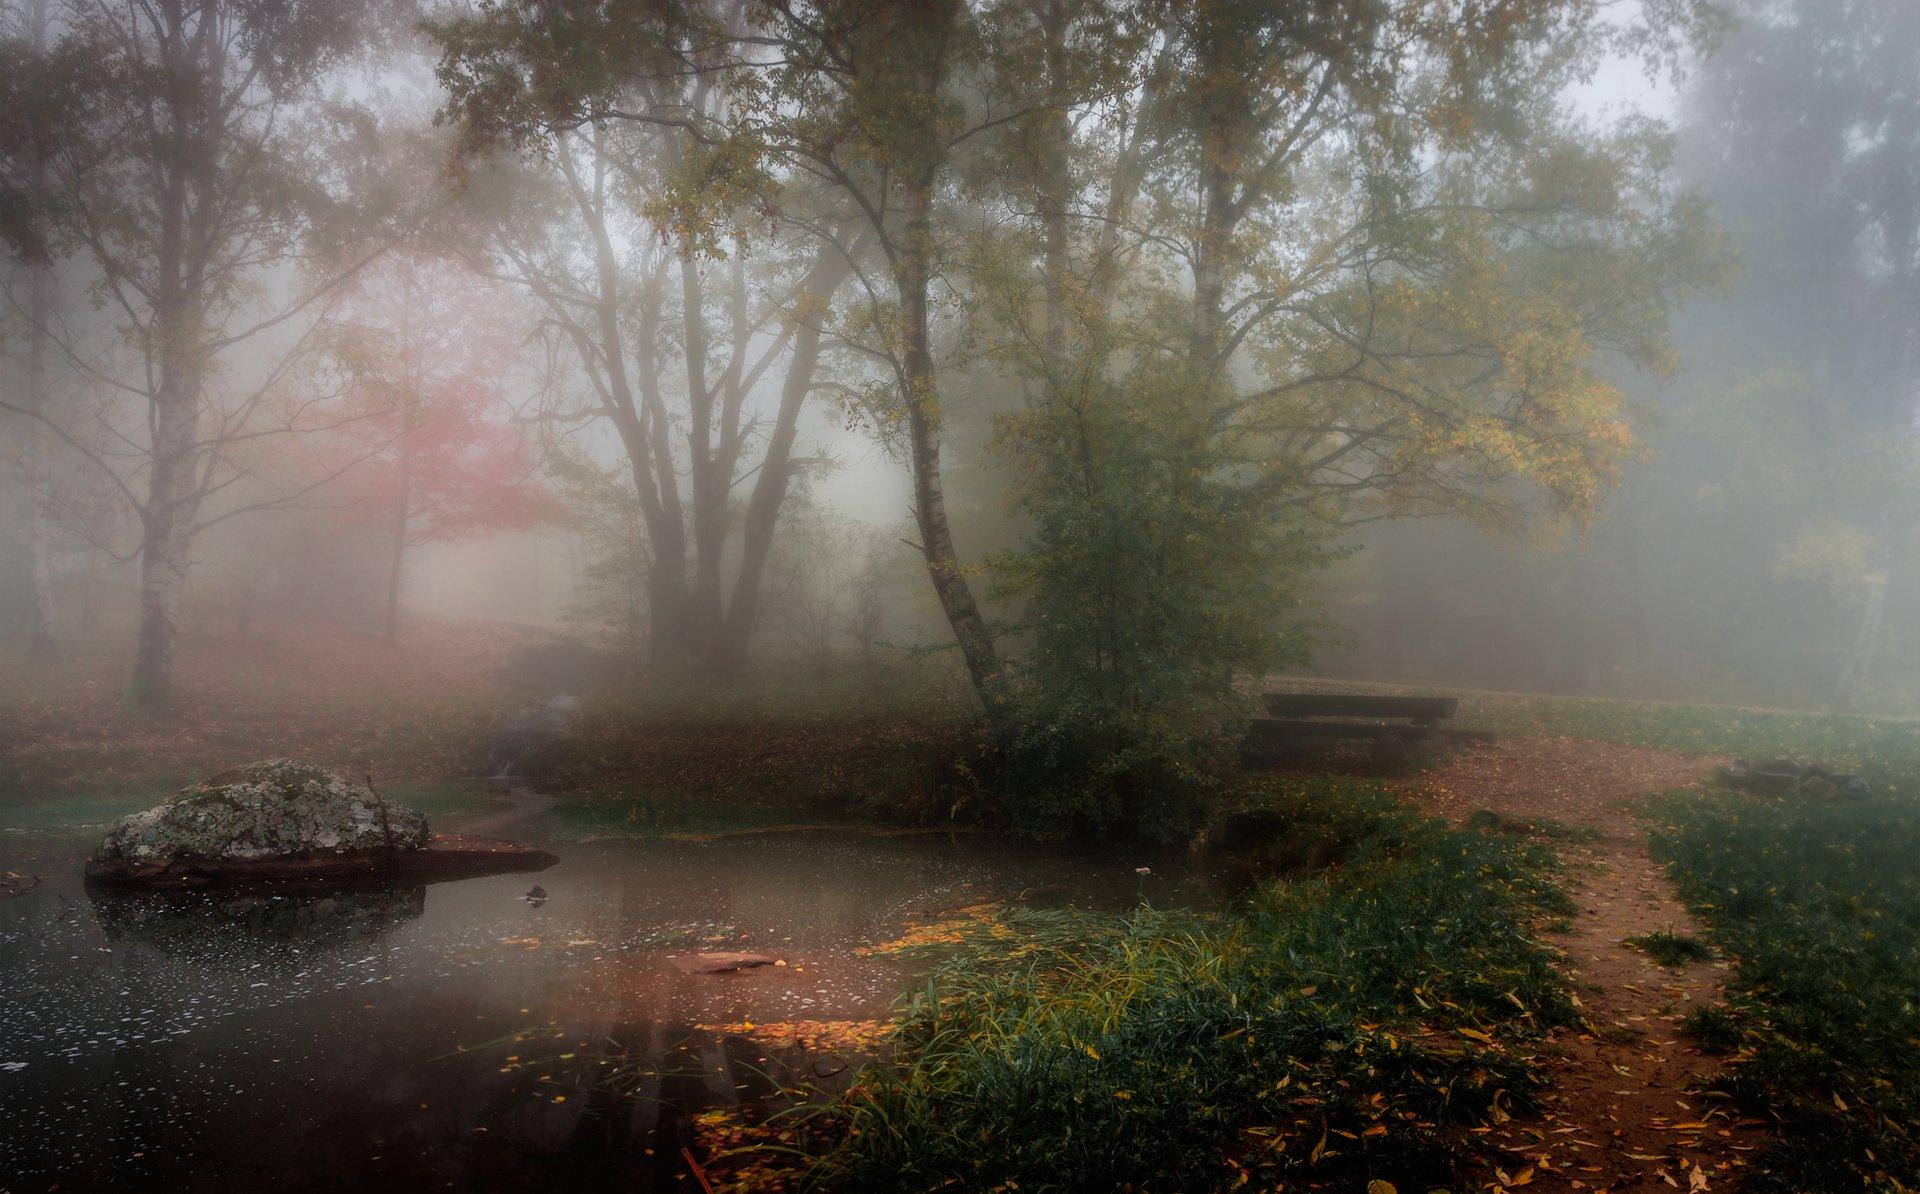 landscape, nature, scenery, forest, wood, mist, misty, fog, foggy, mountain, vitosha, bulgaria, туман, лес, Александър Александров